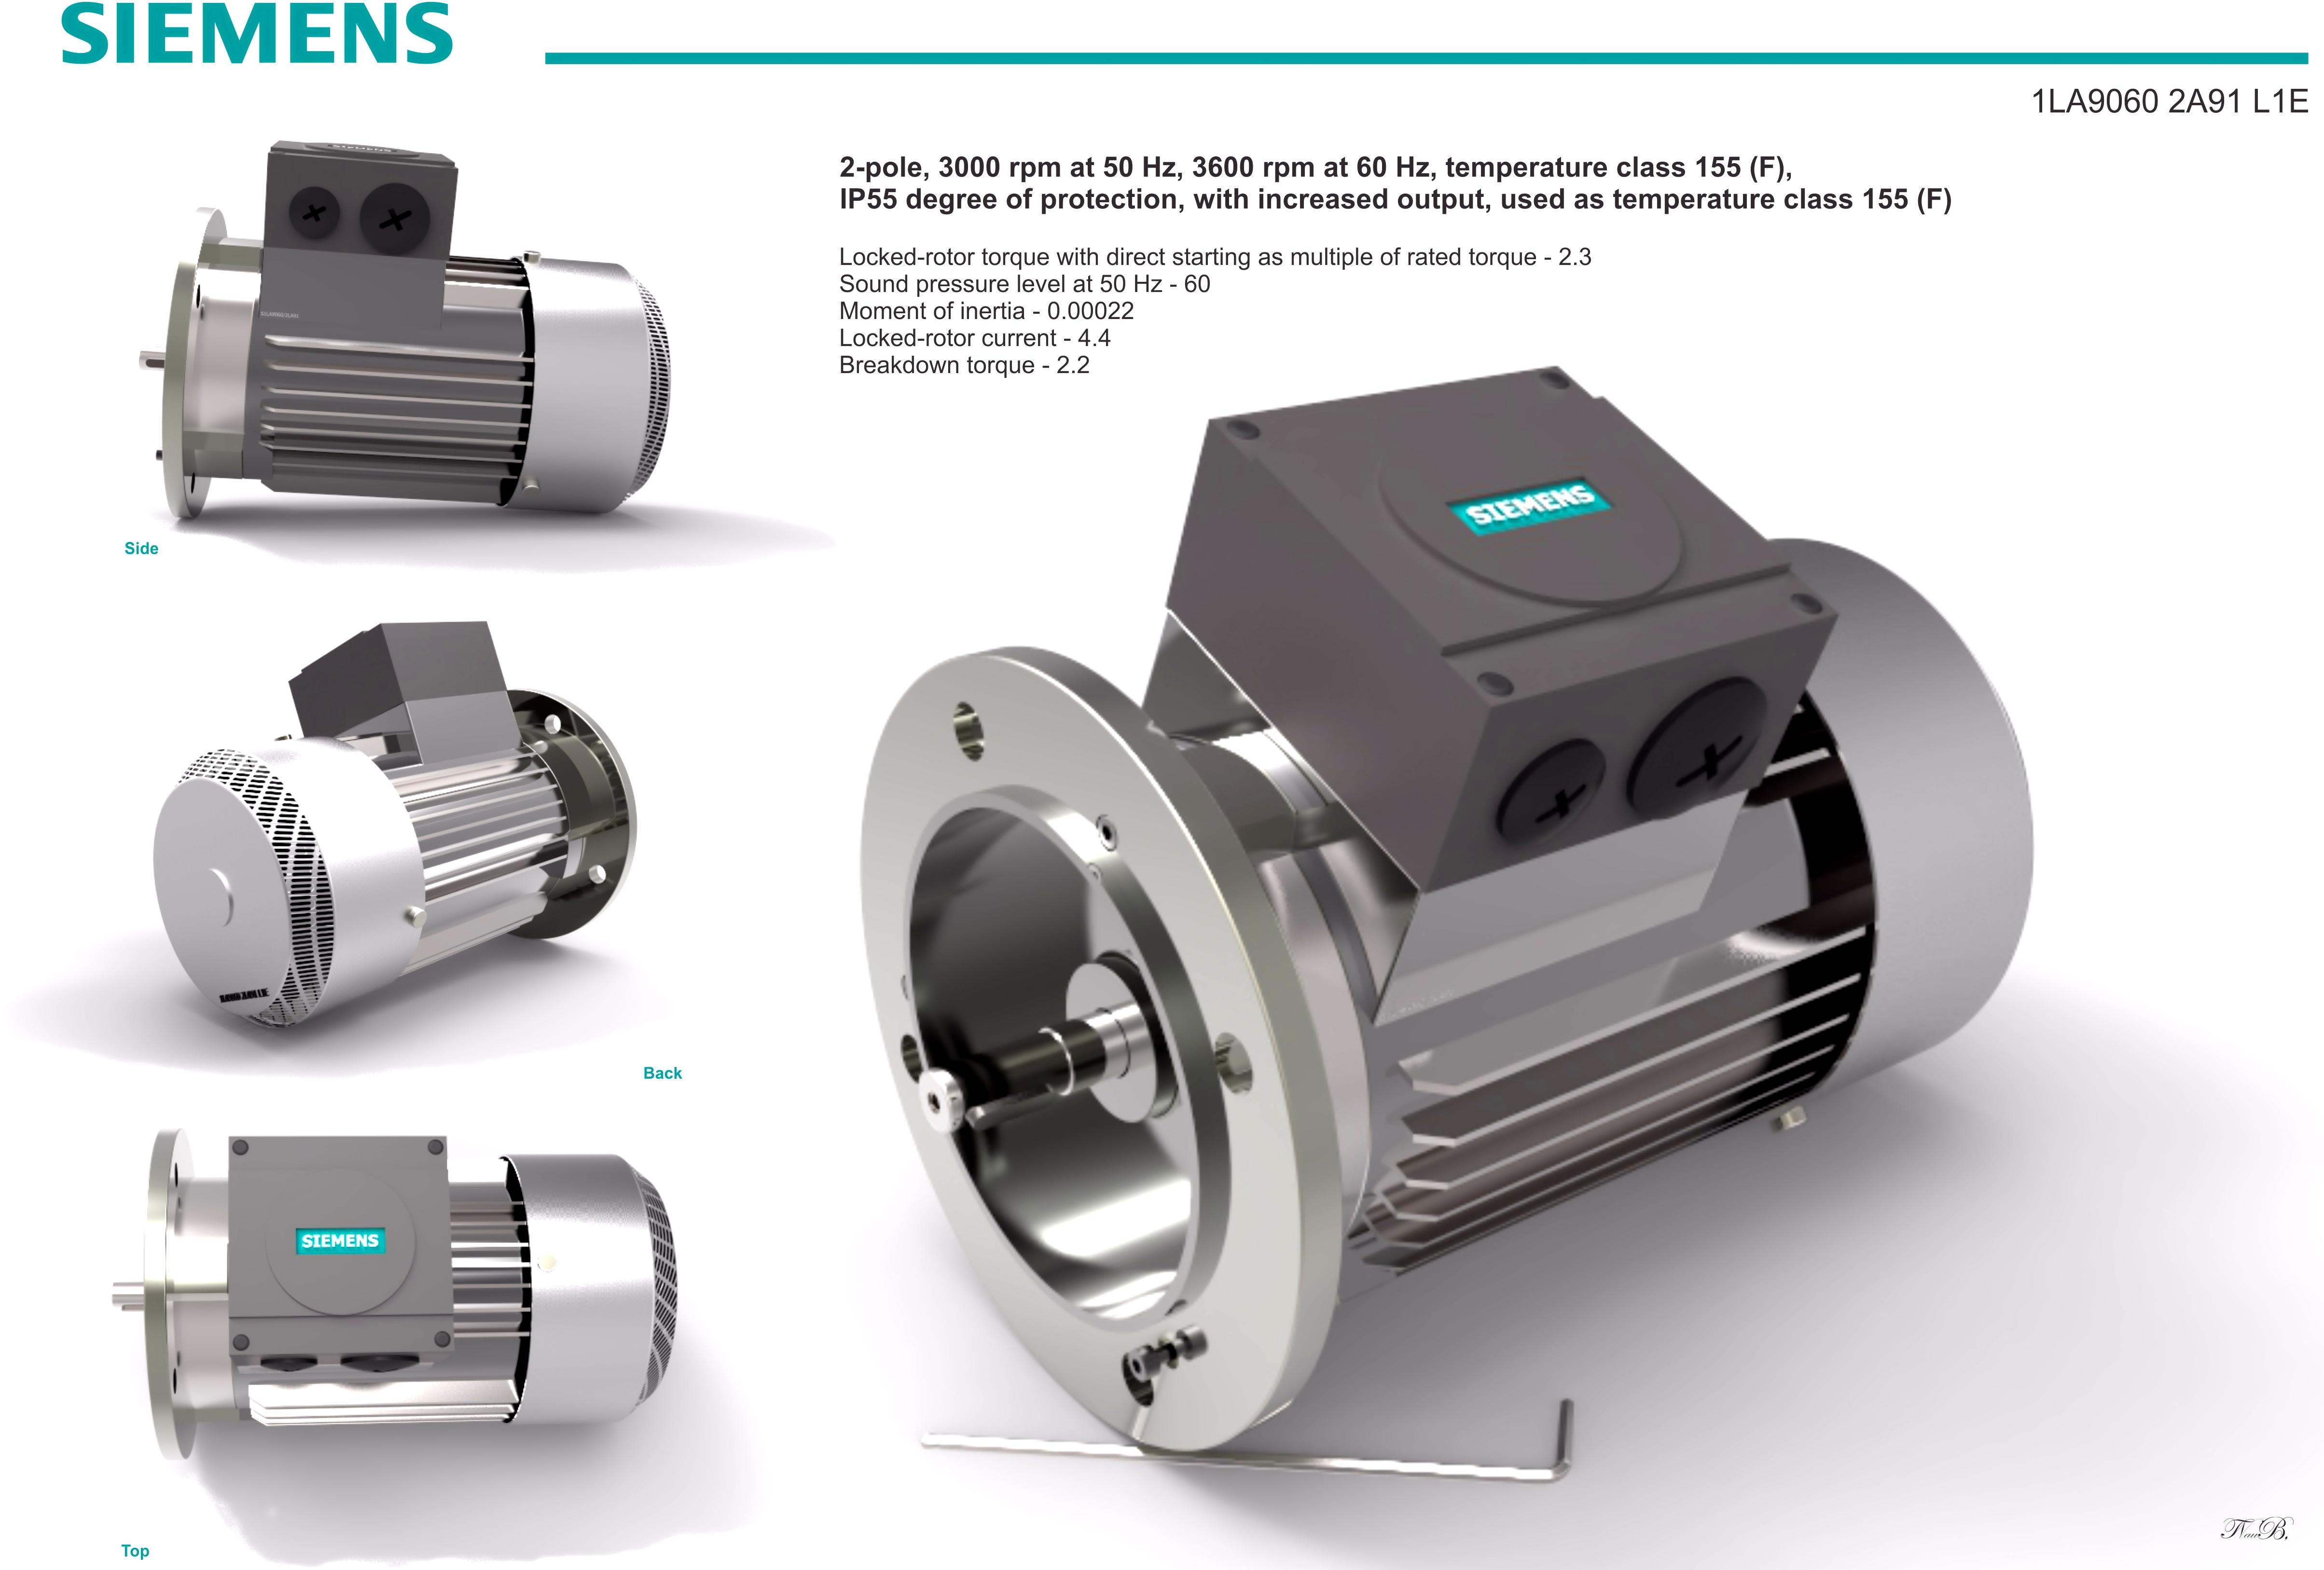 Siemens Pt Karunia Immanuel Sejahtera